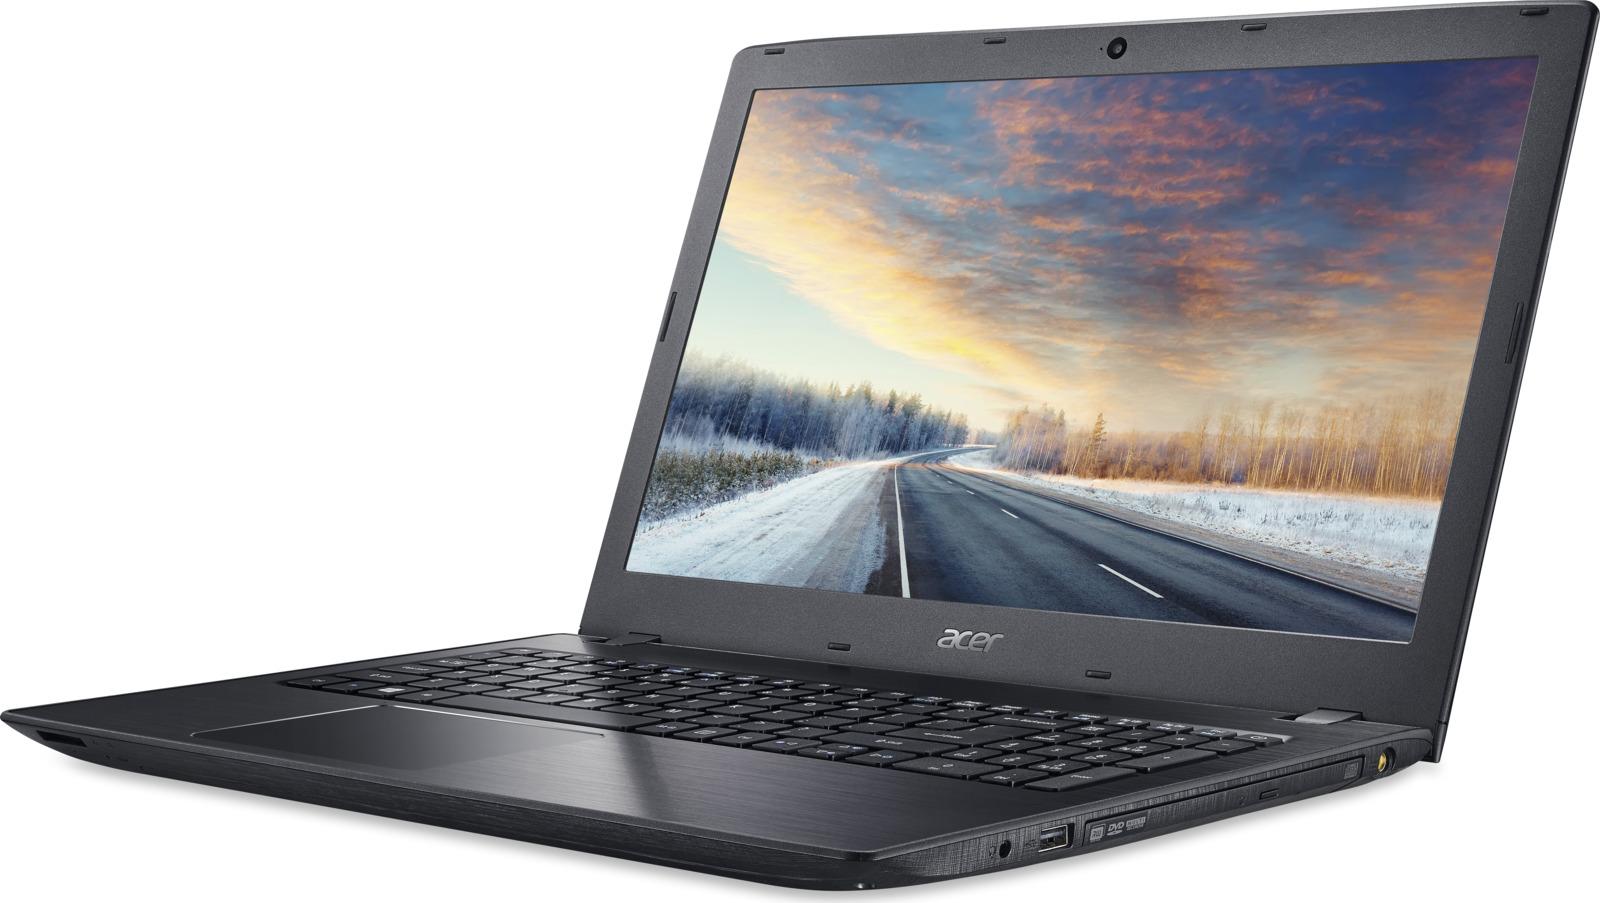 15.6 Ноутбук Acer TravelMate TMP259-MG NX.VE2ER.035 ноутбук 11 дюймов